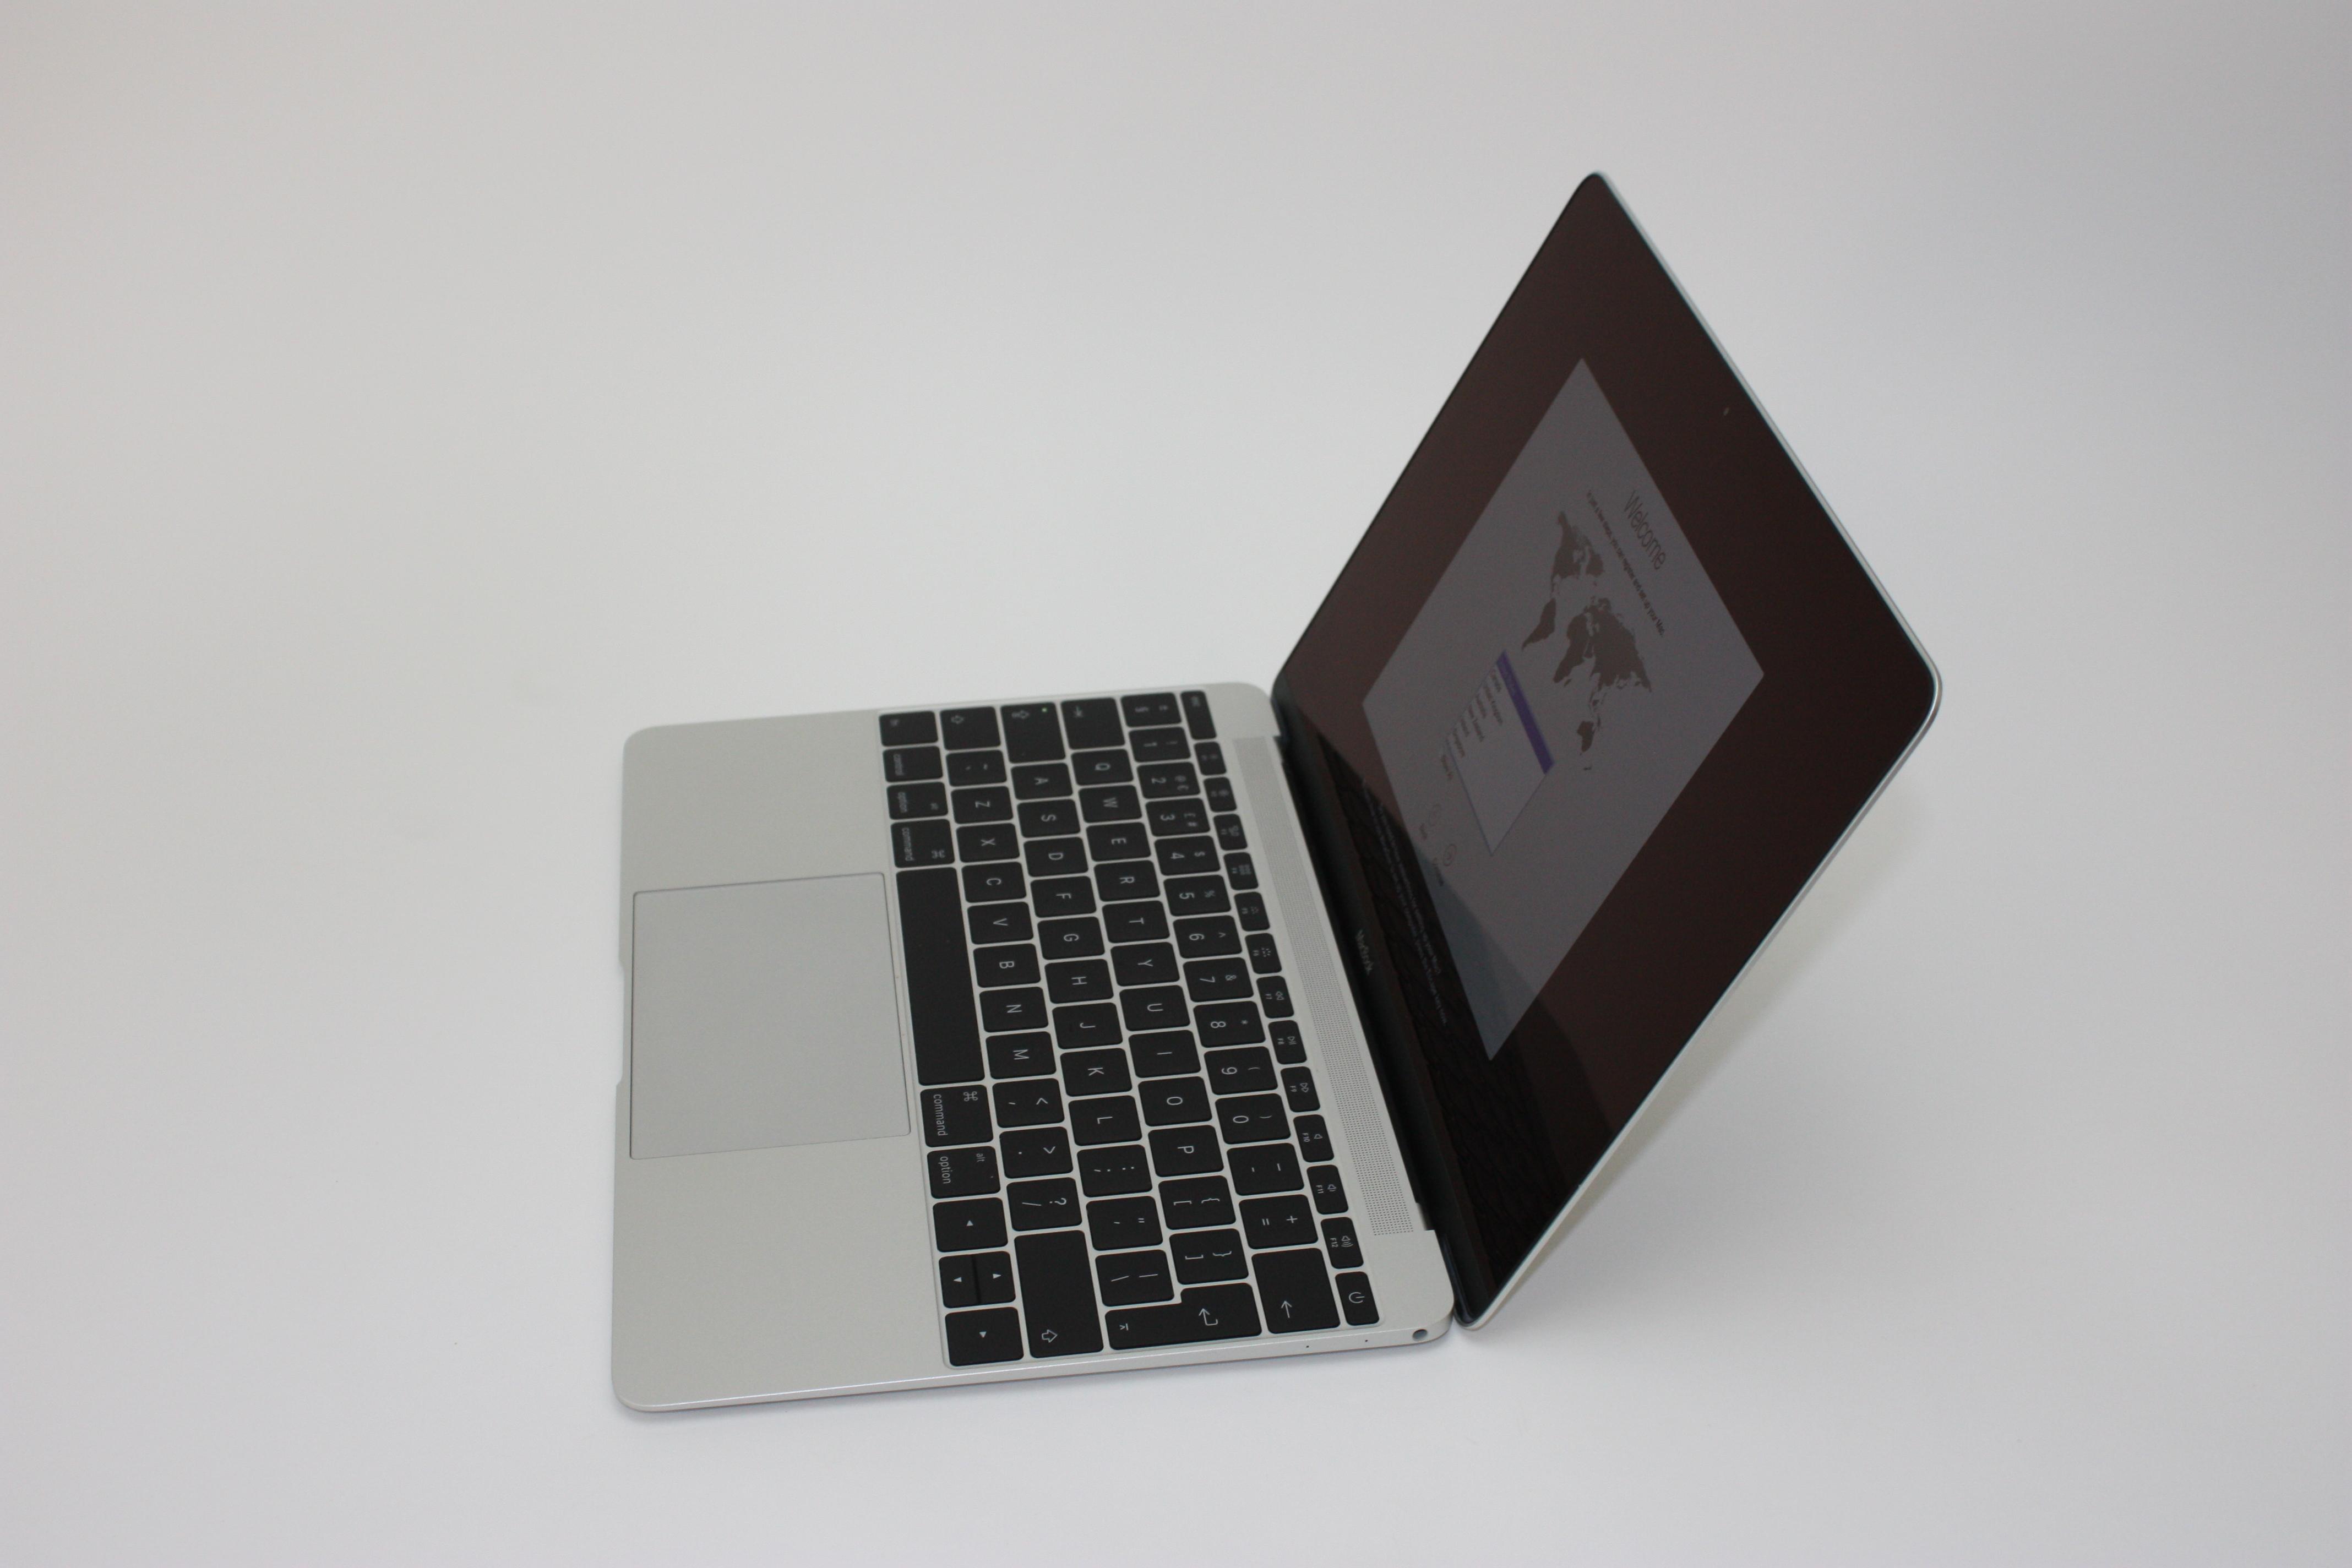 MacBook 12-inch Retina, 1.2 GHz Intel Core M, 8 GB 1600 MHz DDR3, 500 GB Flash Storage, image 2